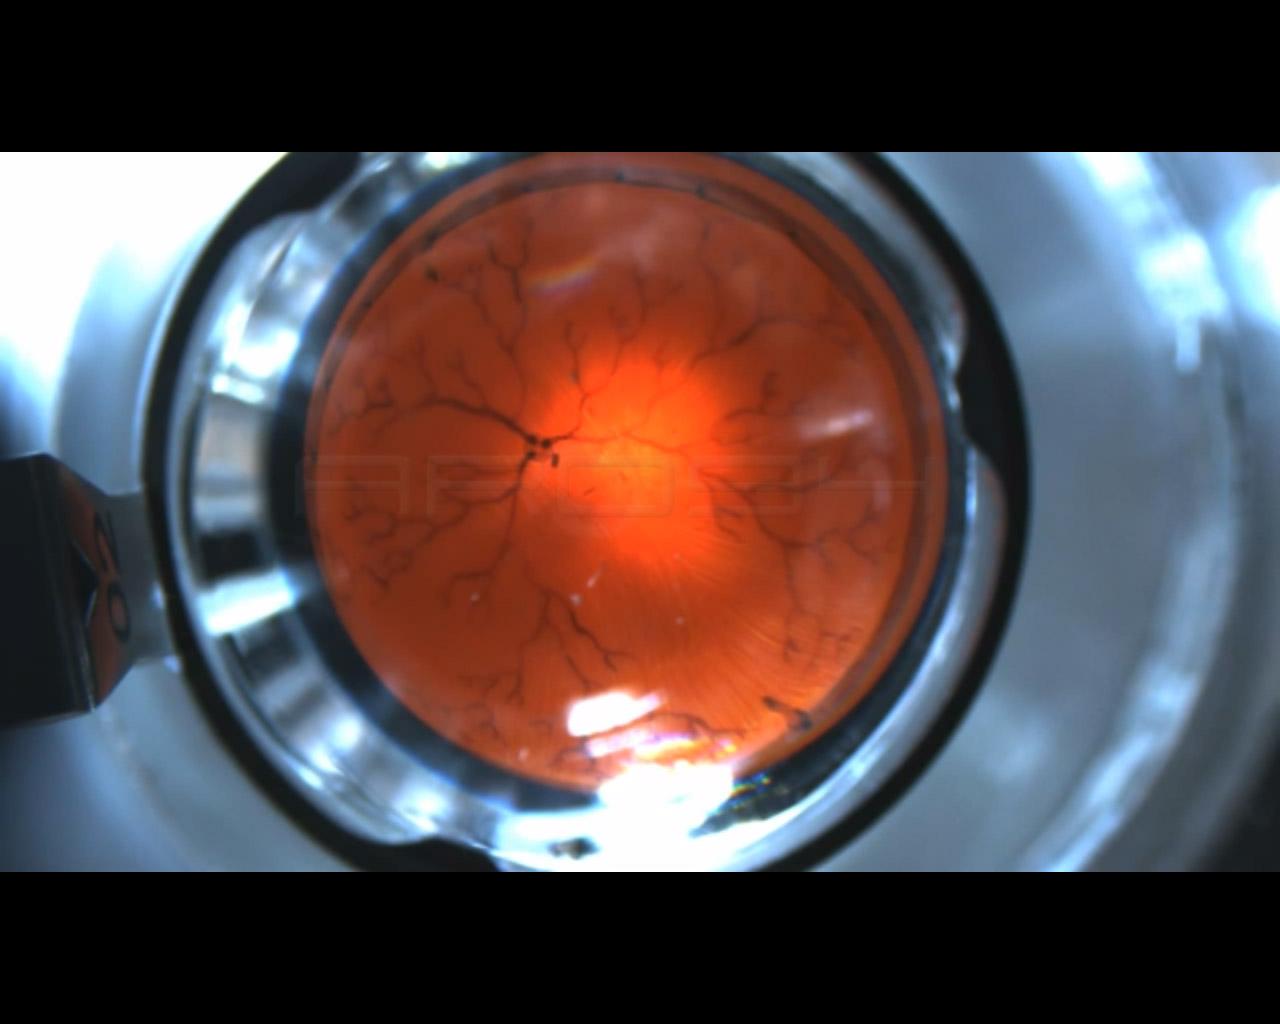 Da Zurigo un nanorobot come chirurgo